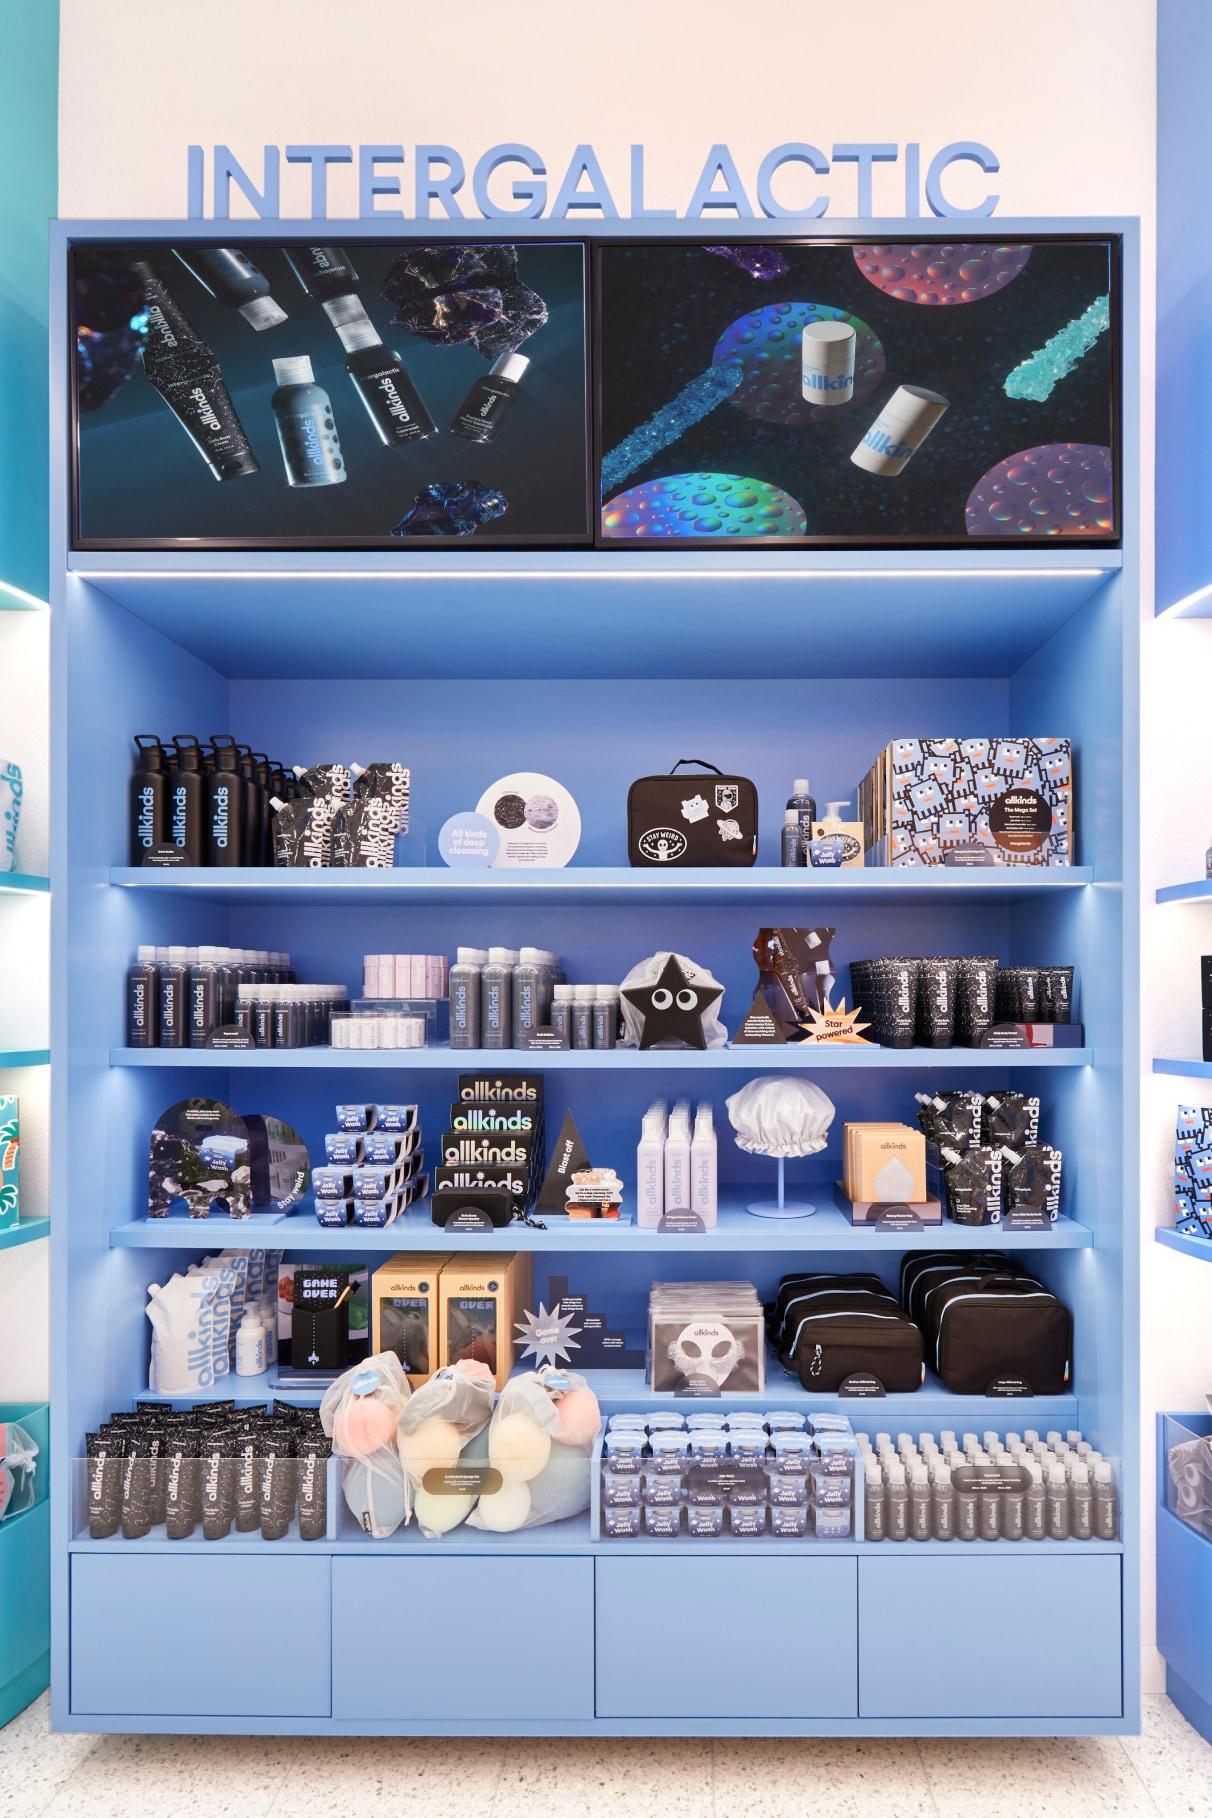 Allkinds Intergalactic world display shelves